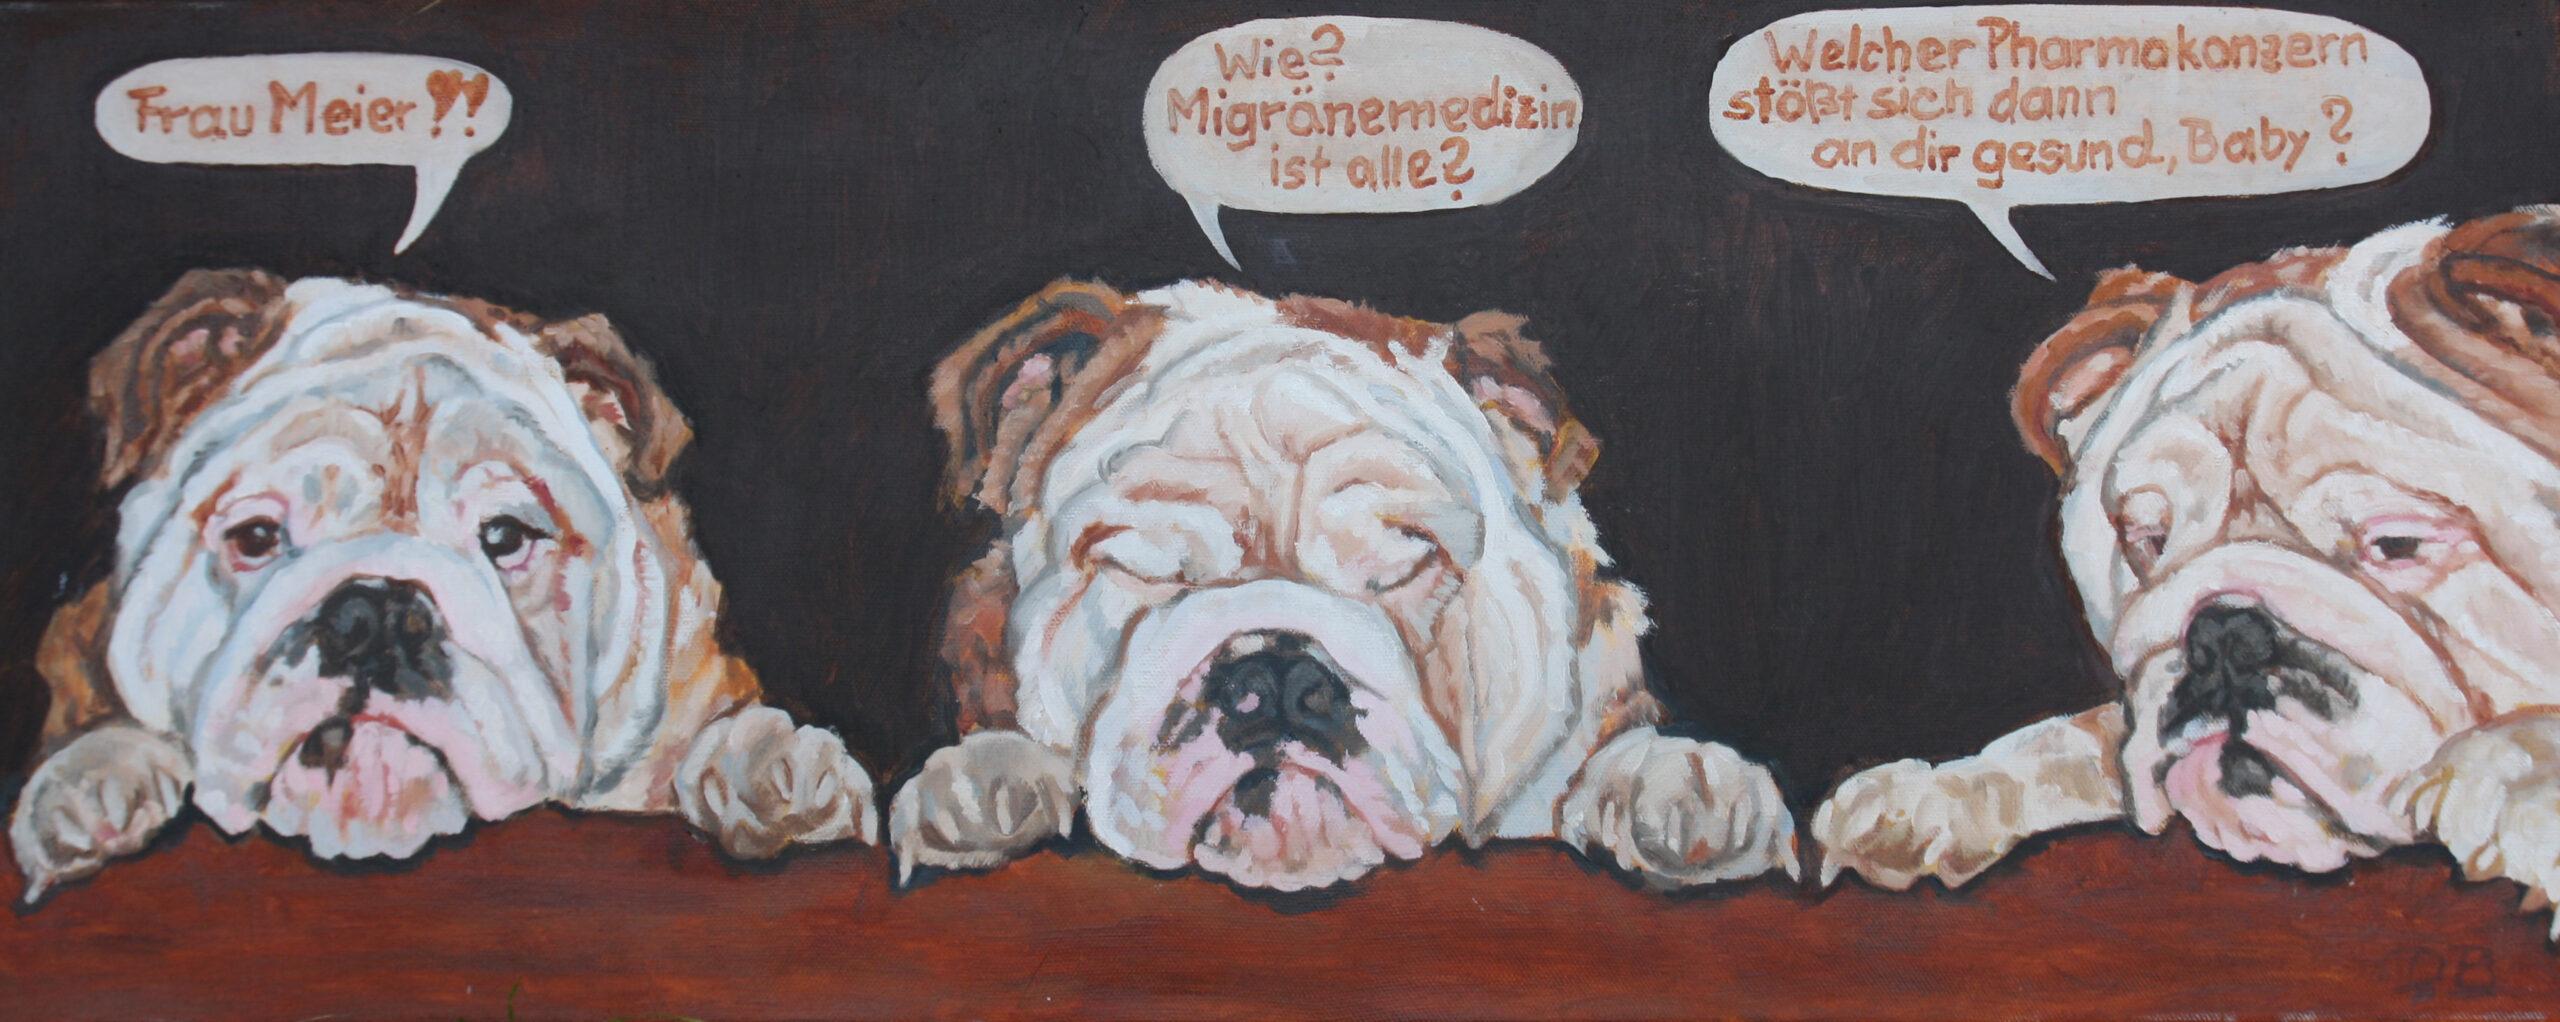 Pech gehabt Moppi!, 40x80, 2014